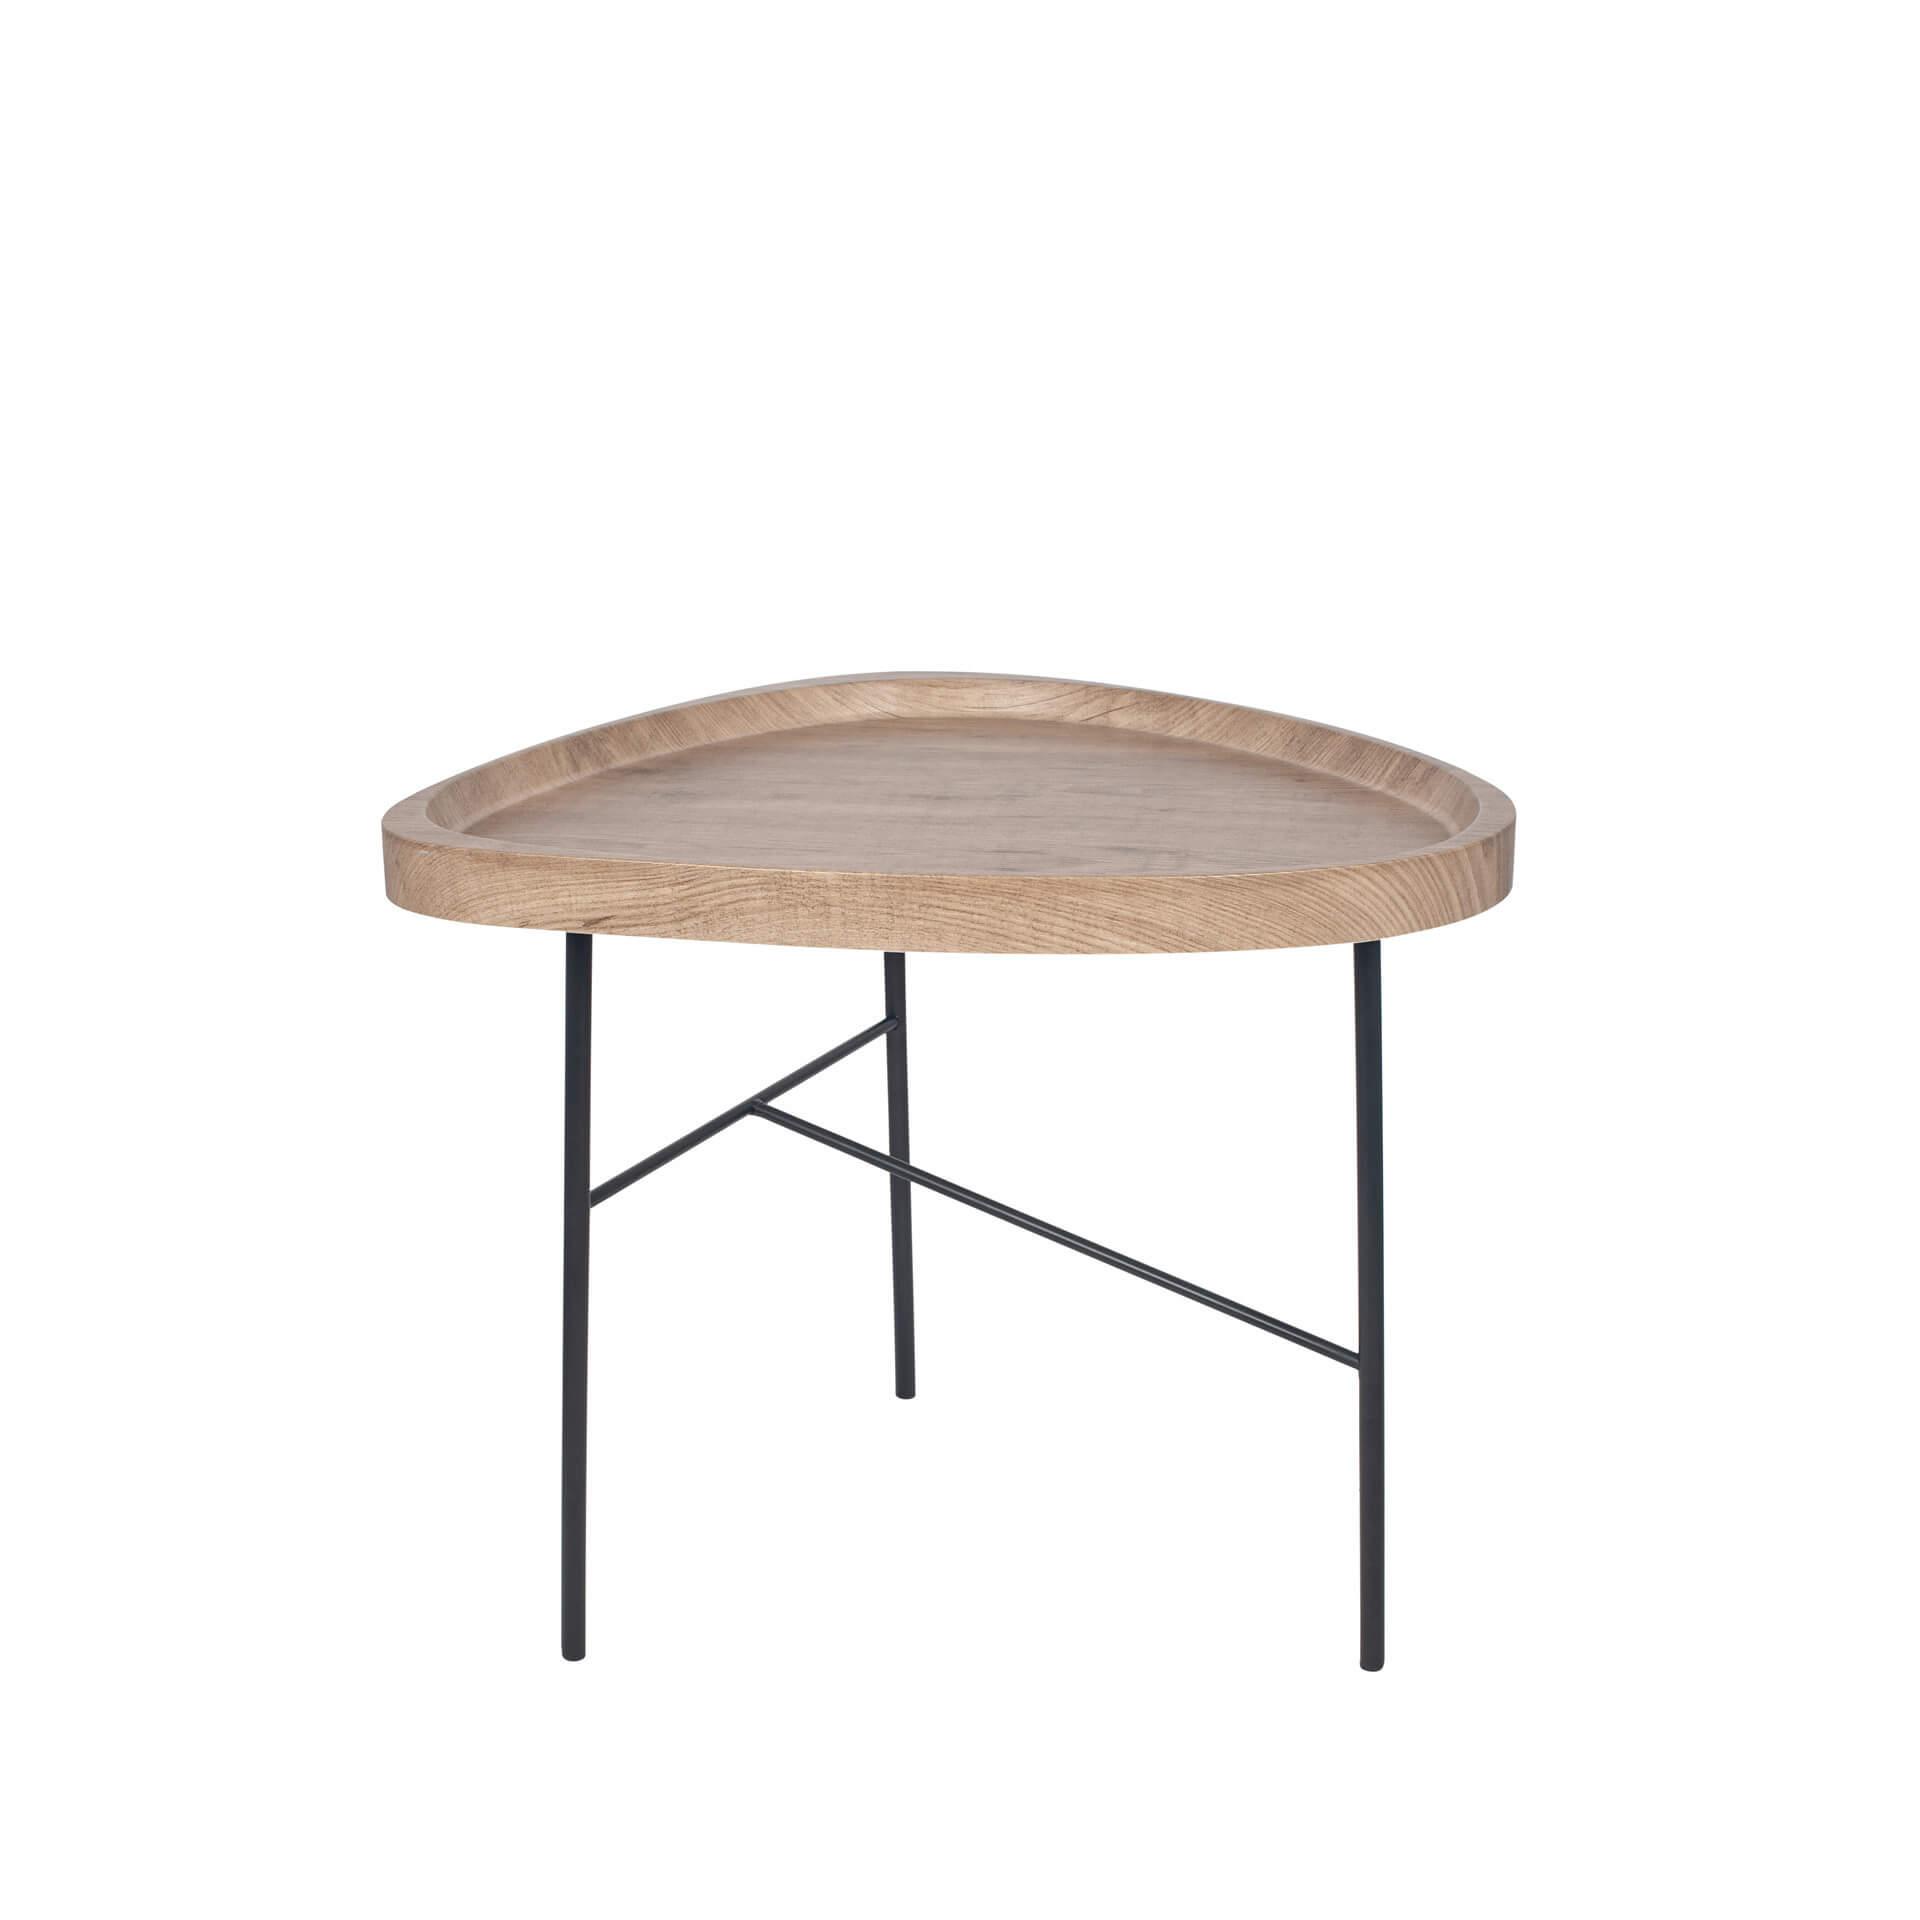 Avezzano Side Table